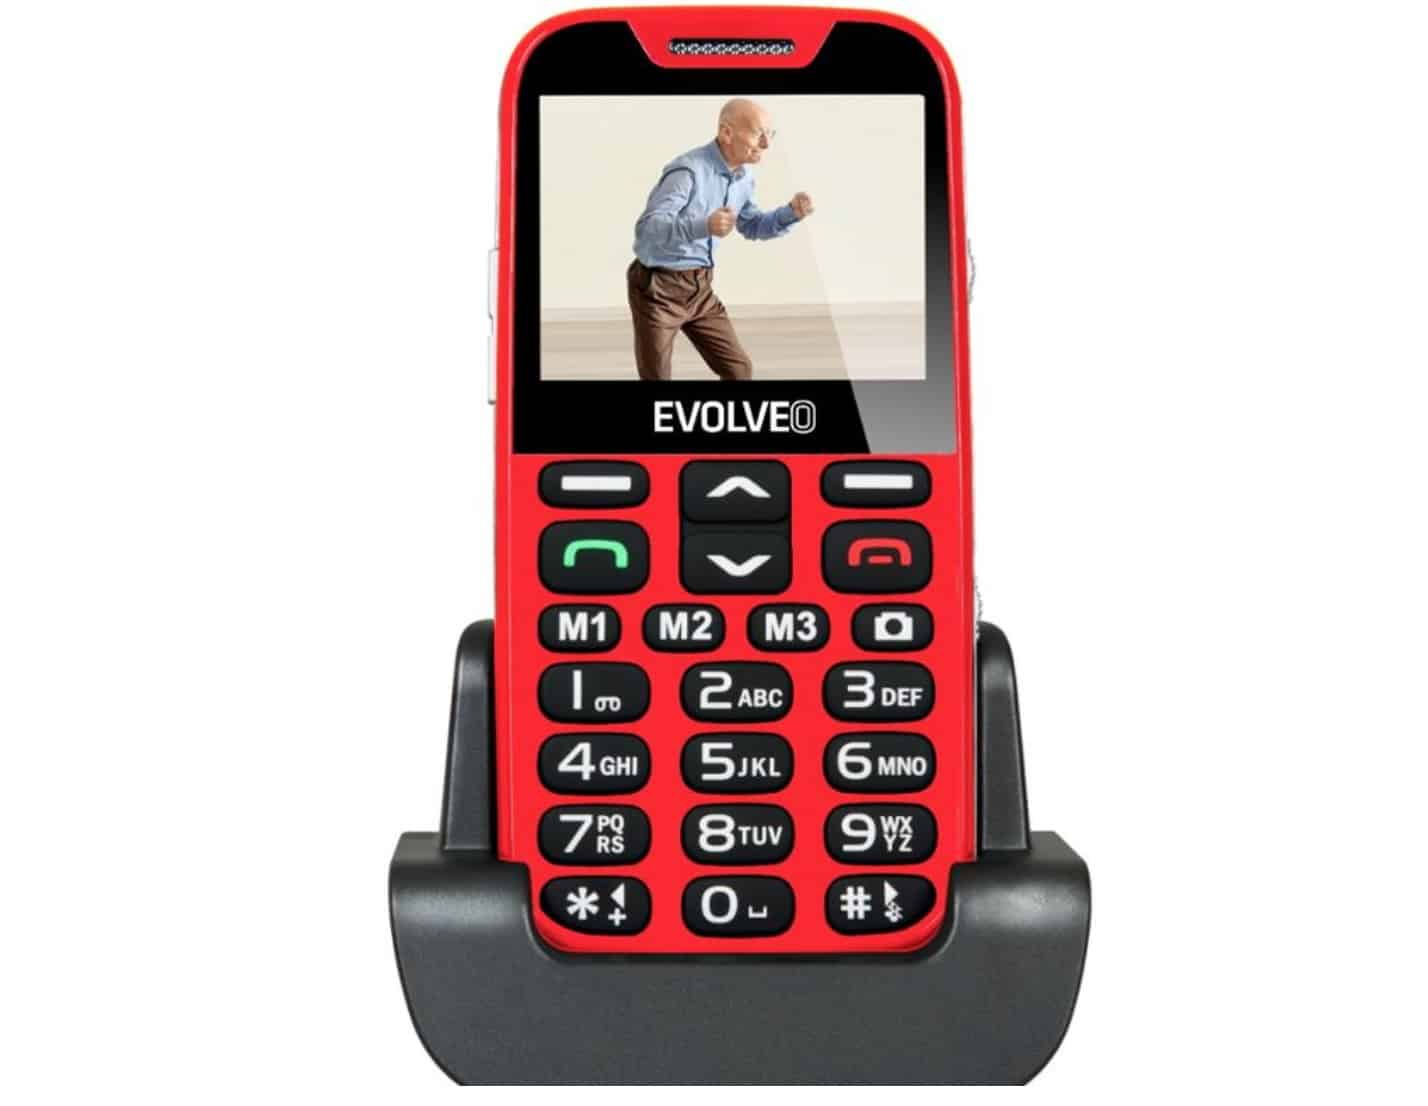 EVOLVEO-EasyPhone-XD